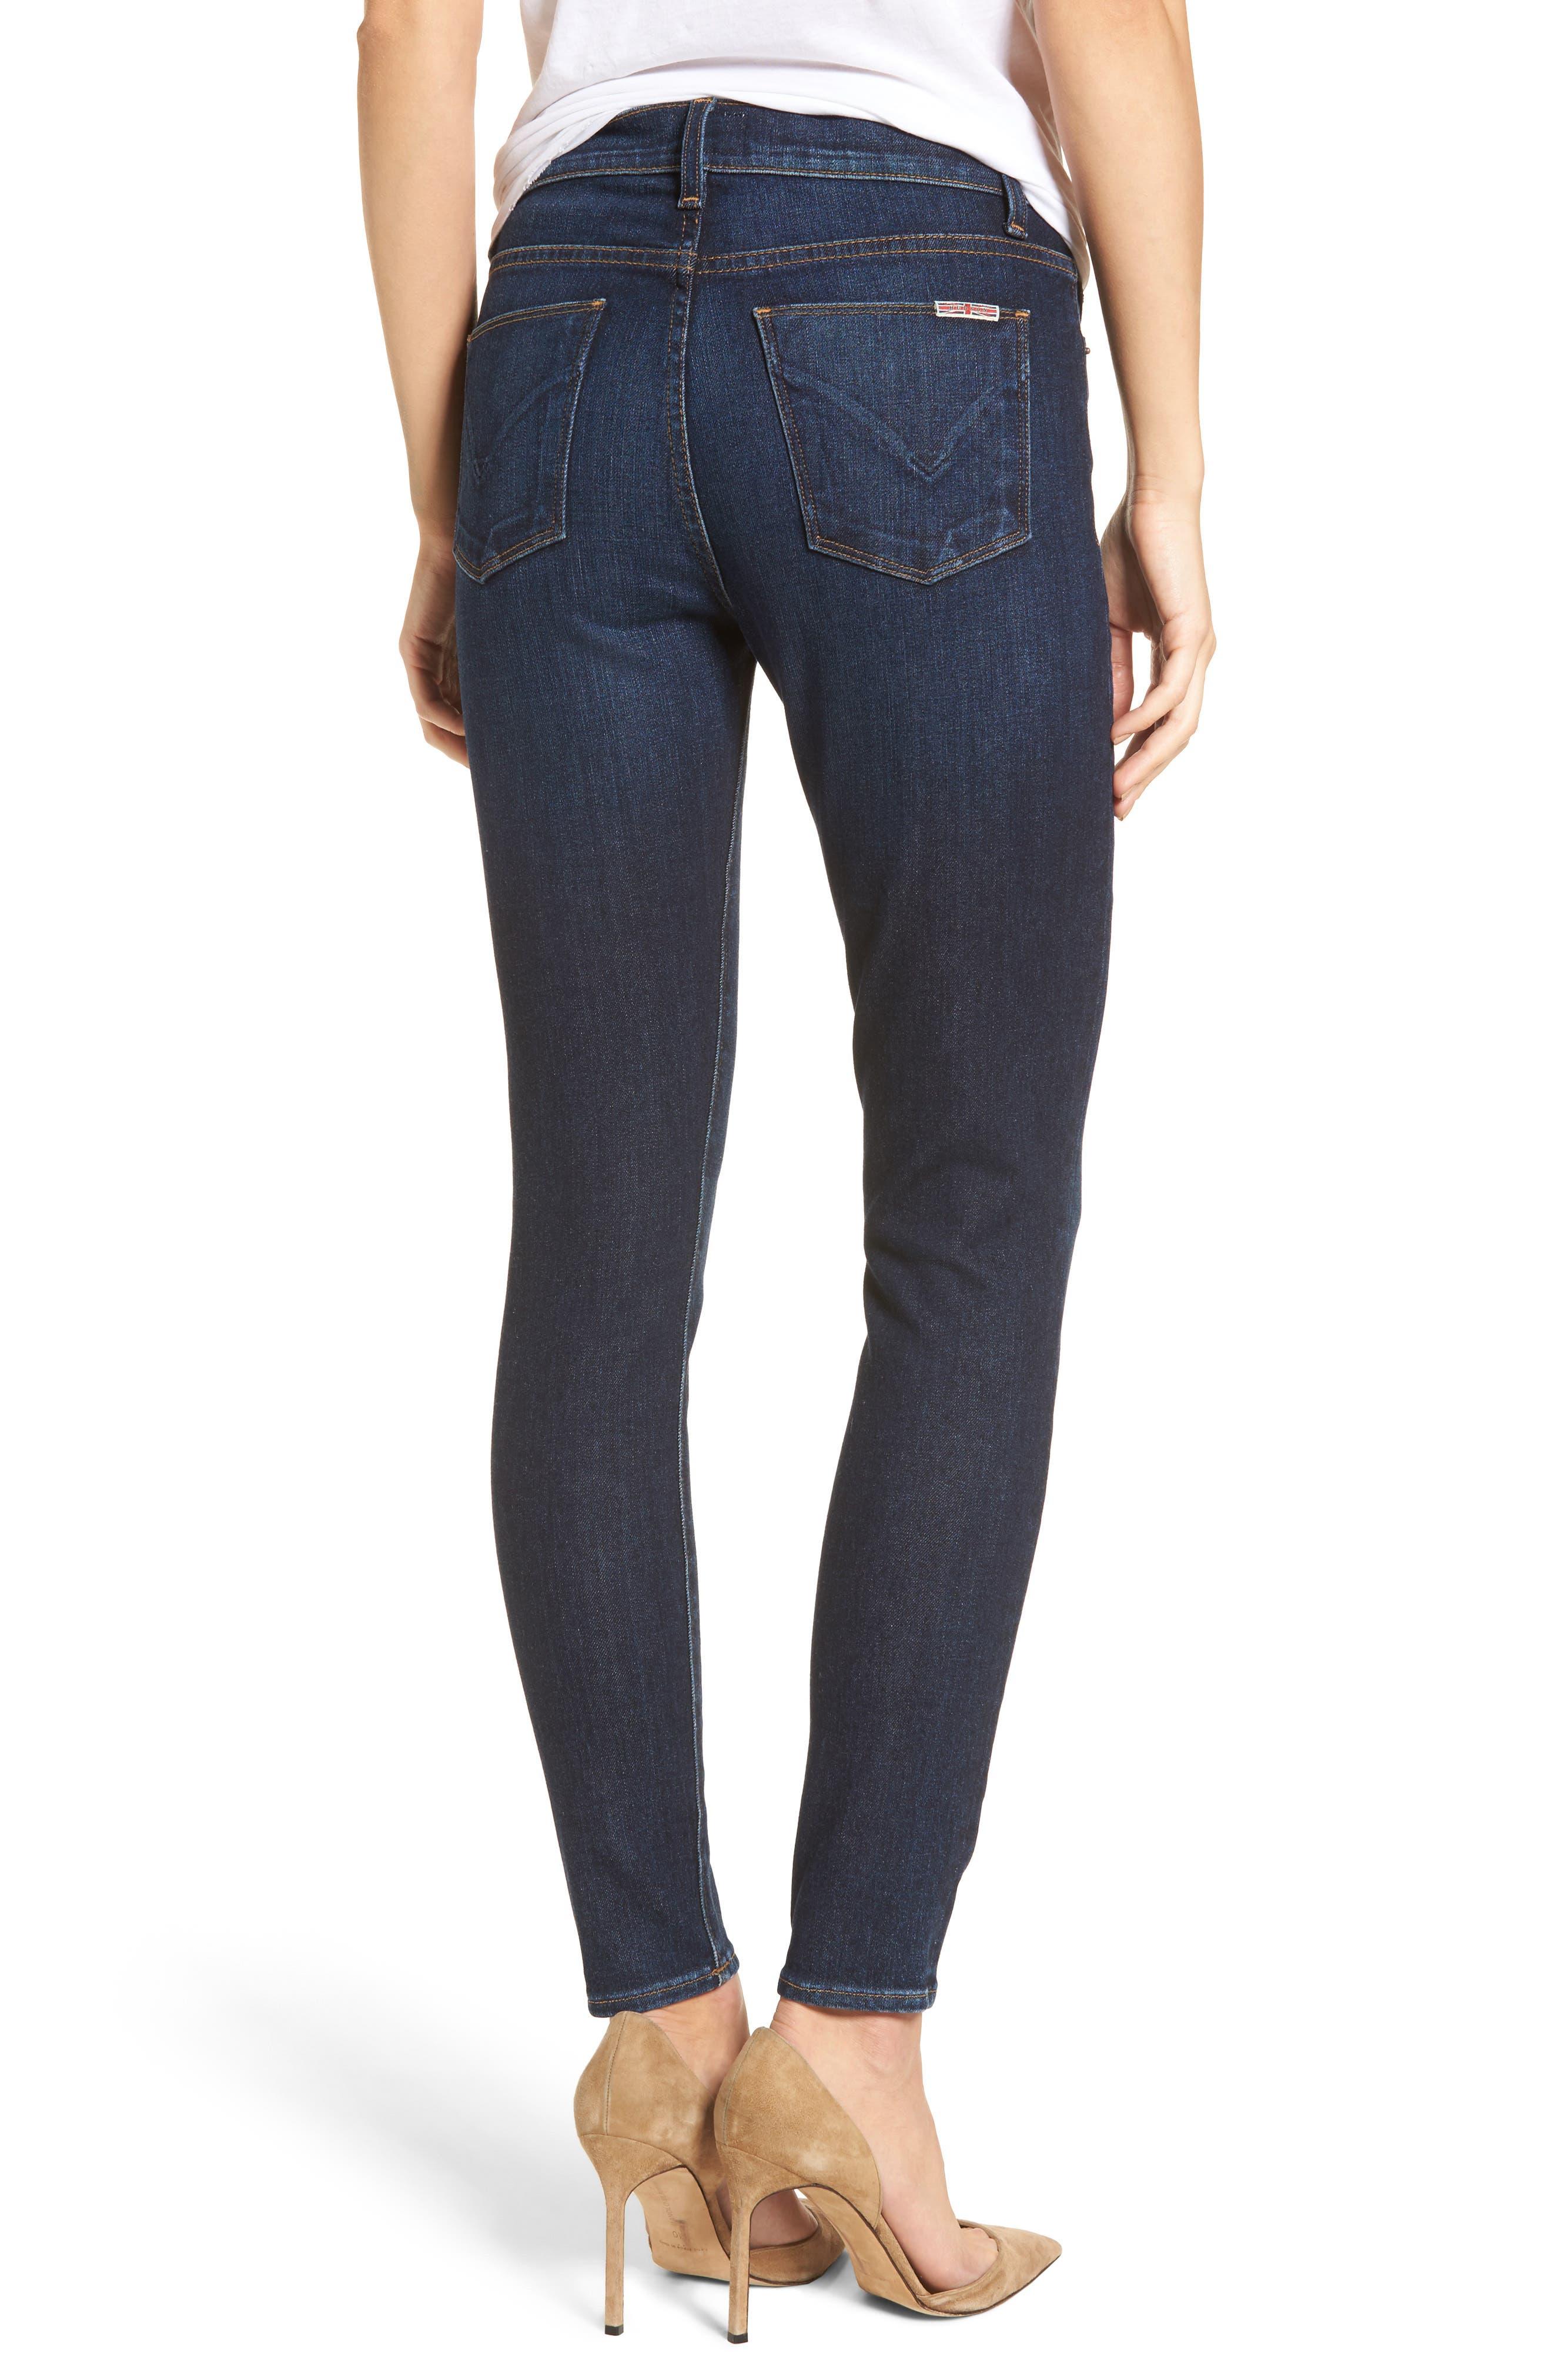 Barbara High Waist Ankle Super Skinny Jeans,                             Alternate thumbnail 2, color,                             402